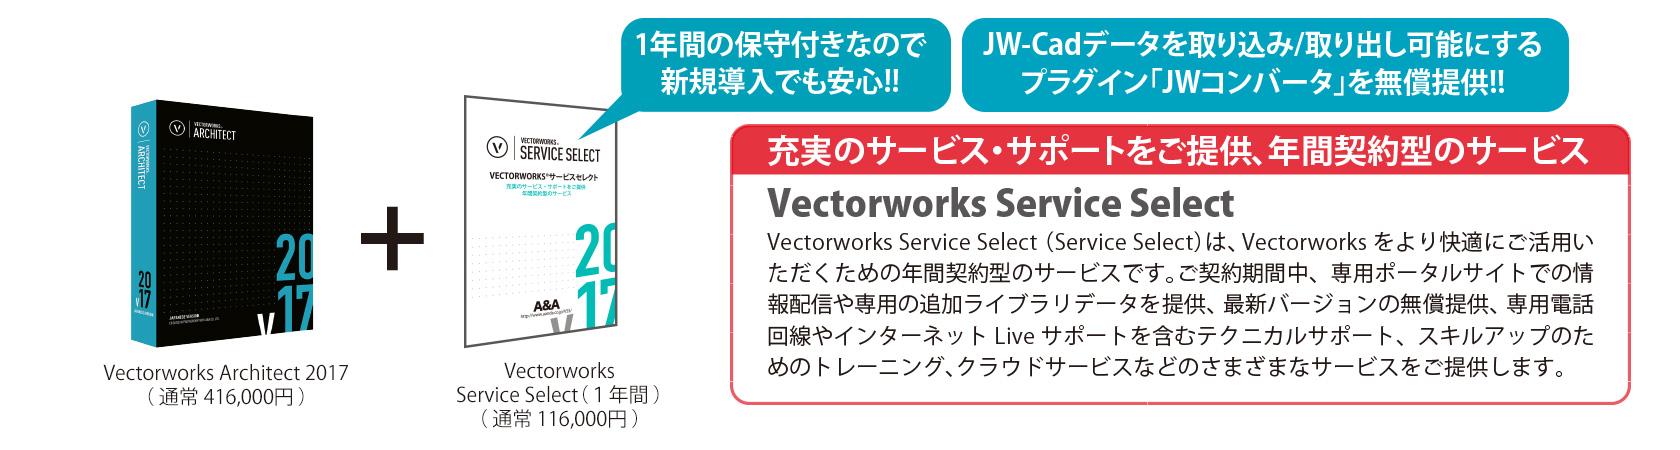 Vectorworks学生単年度版 - aanda.co.jp